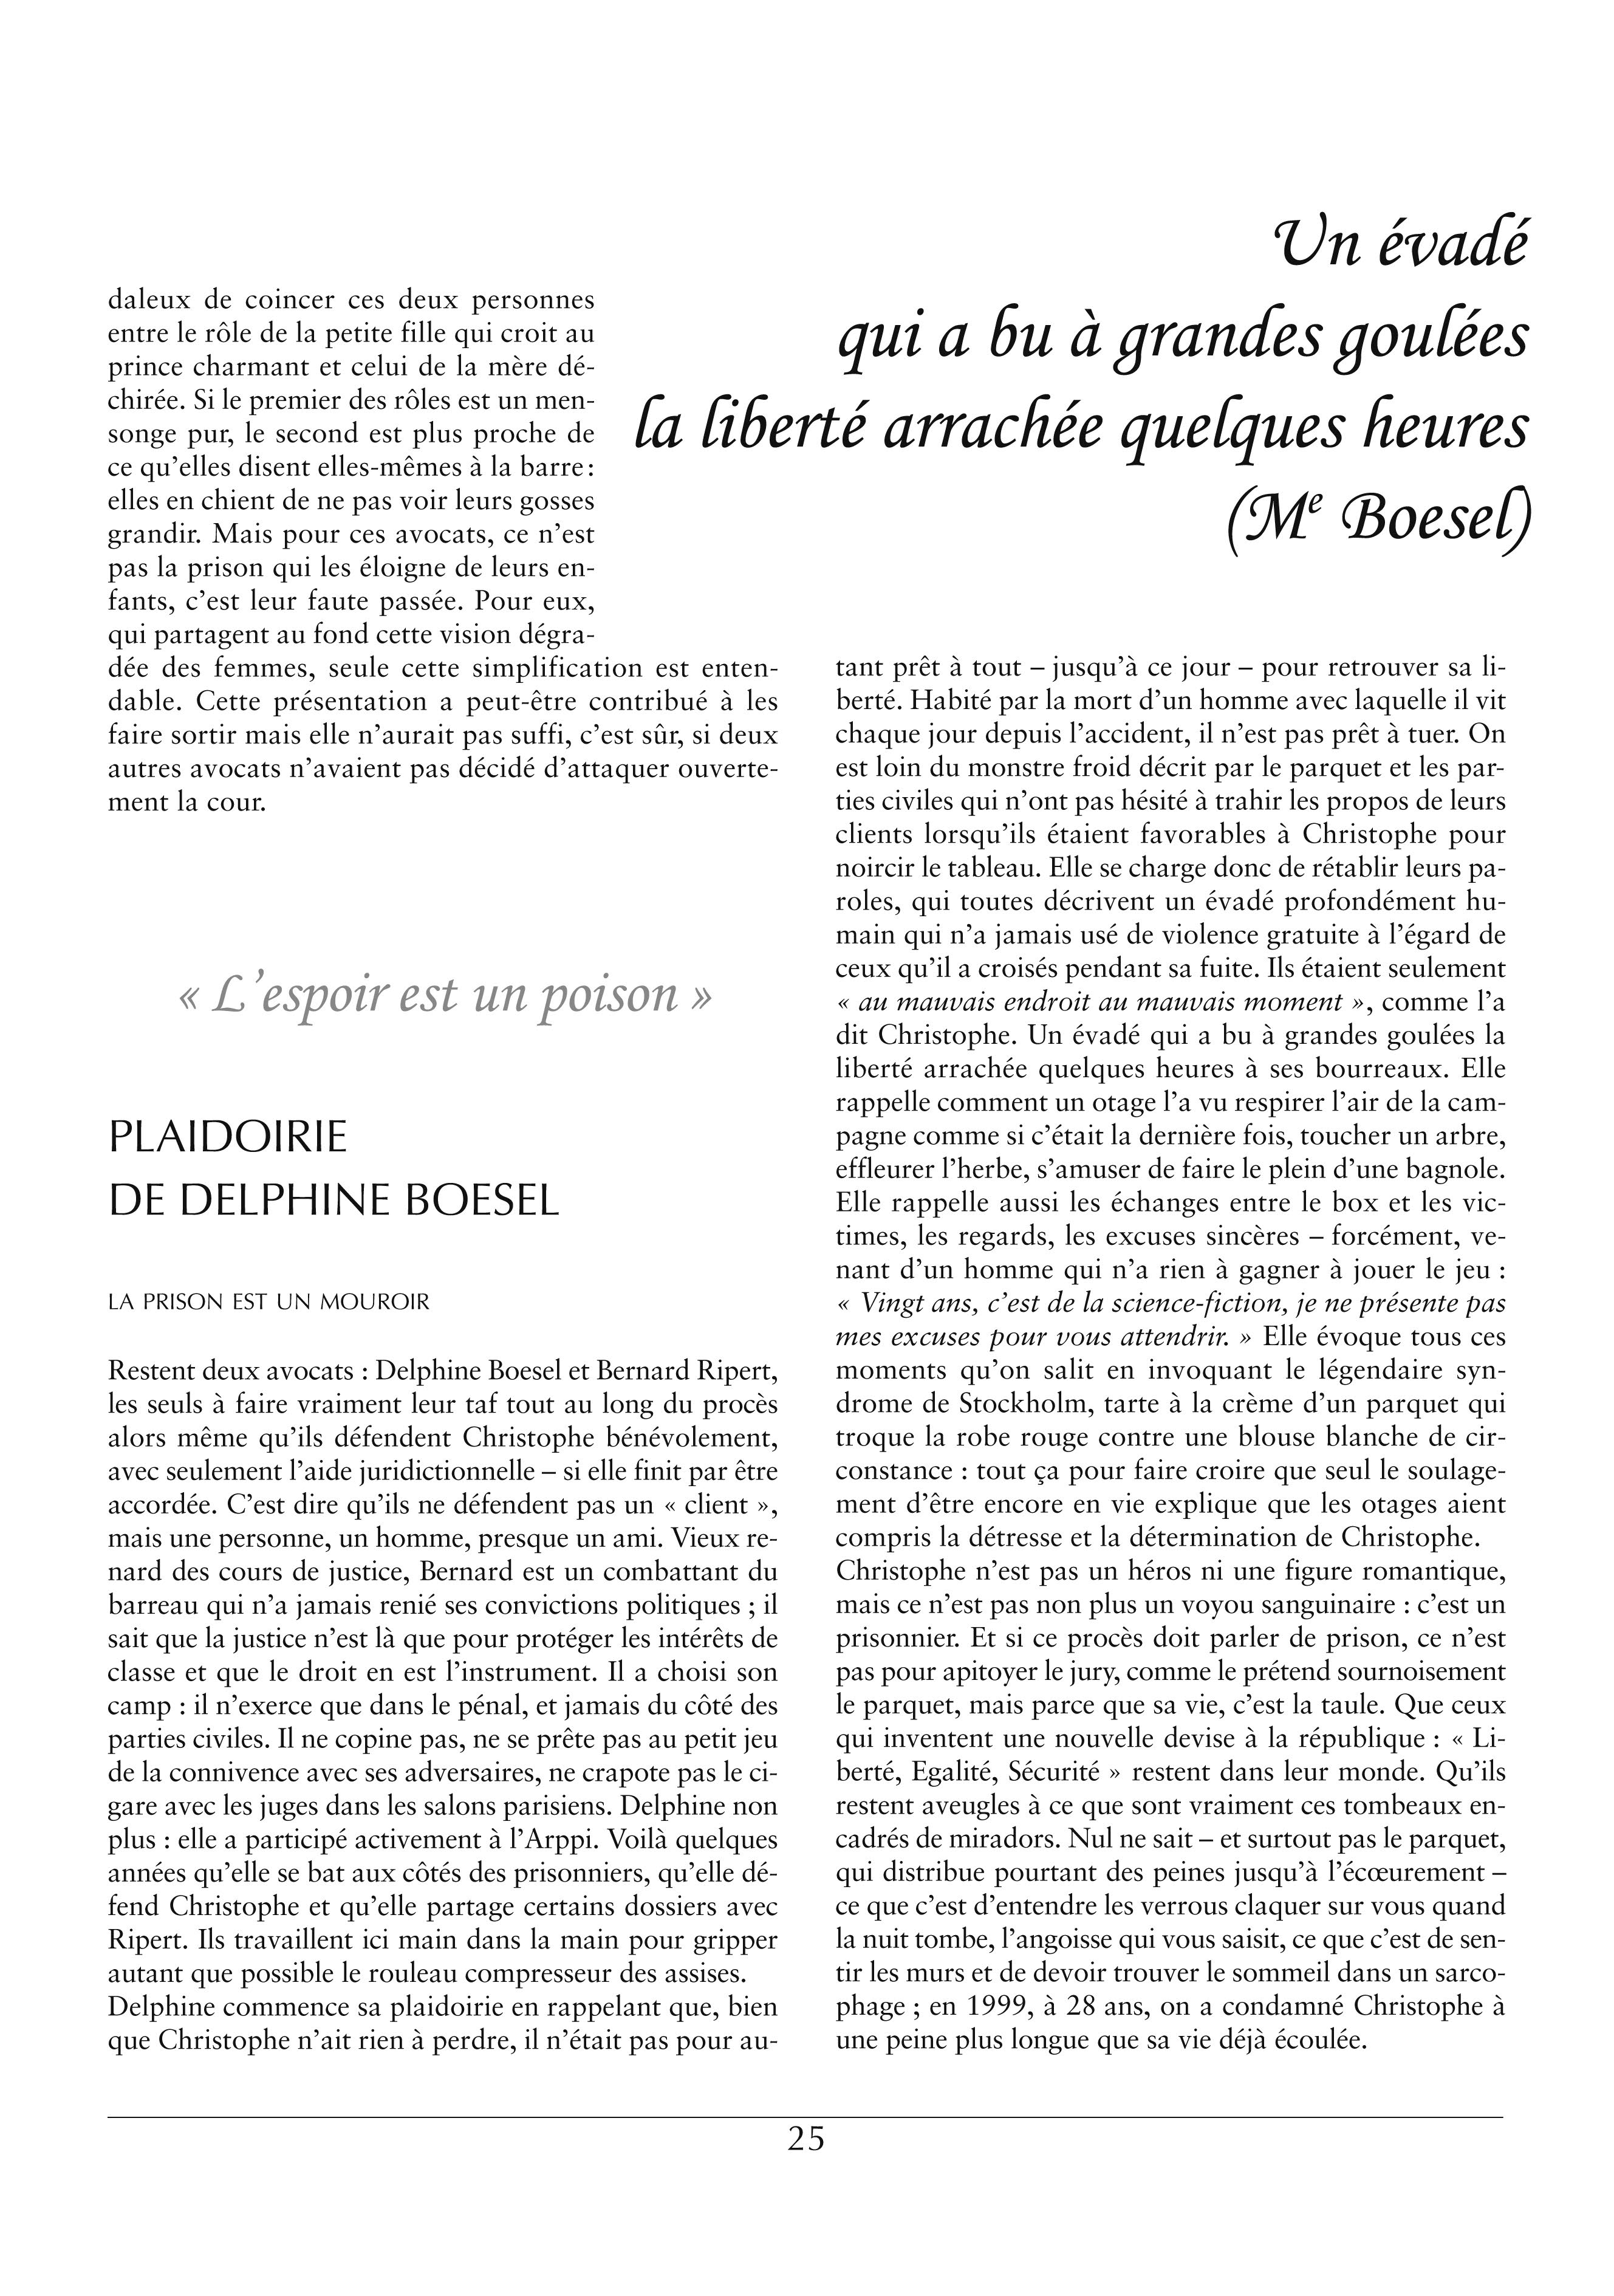 lenvolee_35 1_Page_25